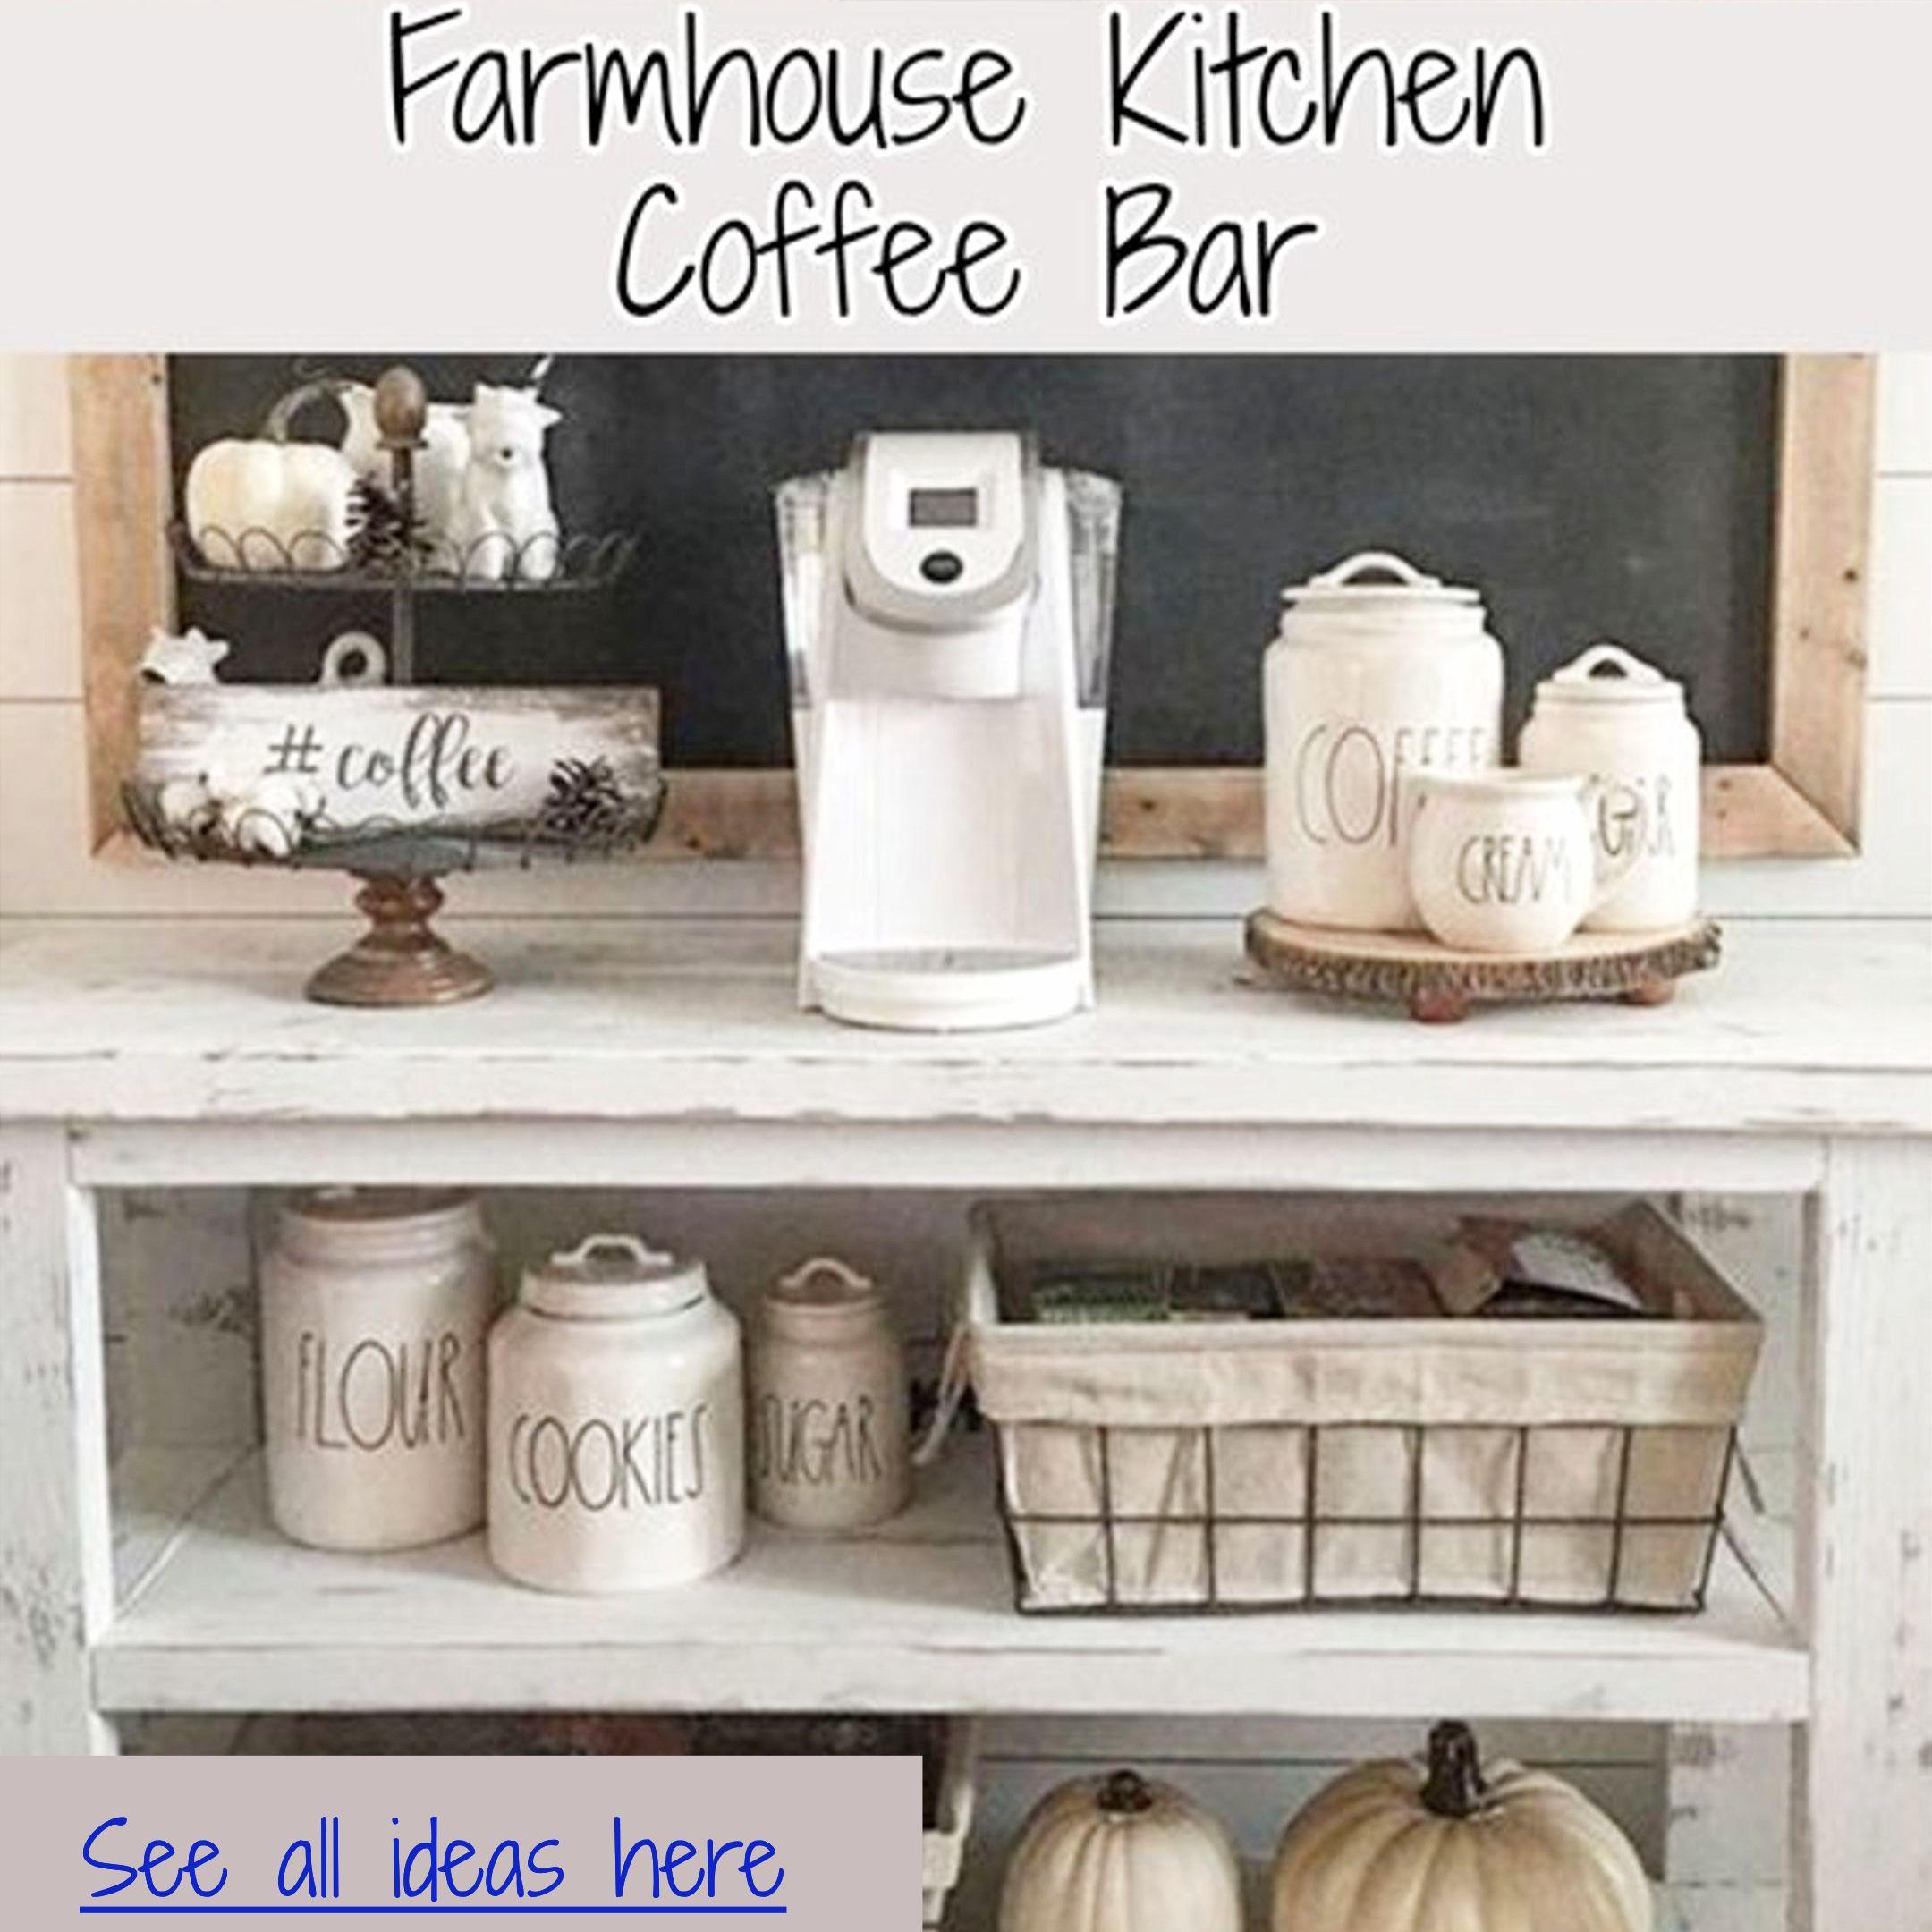 Farmhouse Kitchen Canister Sets And Farmhouse Kitchen Decor Ideas Coffee Bar Ideas Too Farmhouse Coffee Bar Farmhouse Kitchen Canisters Farmhouse Kitchen Decor